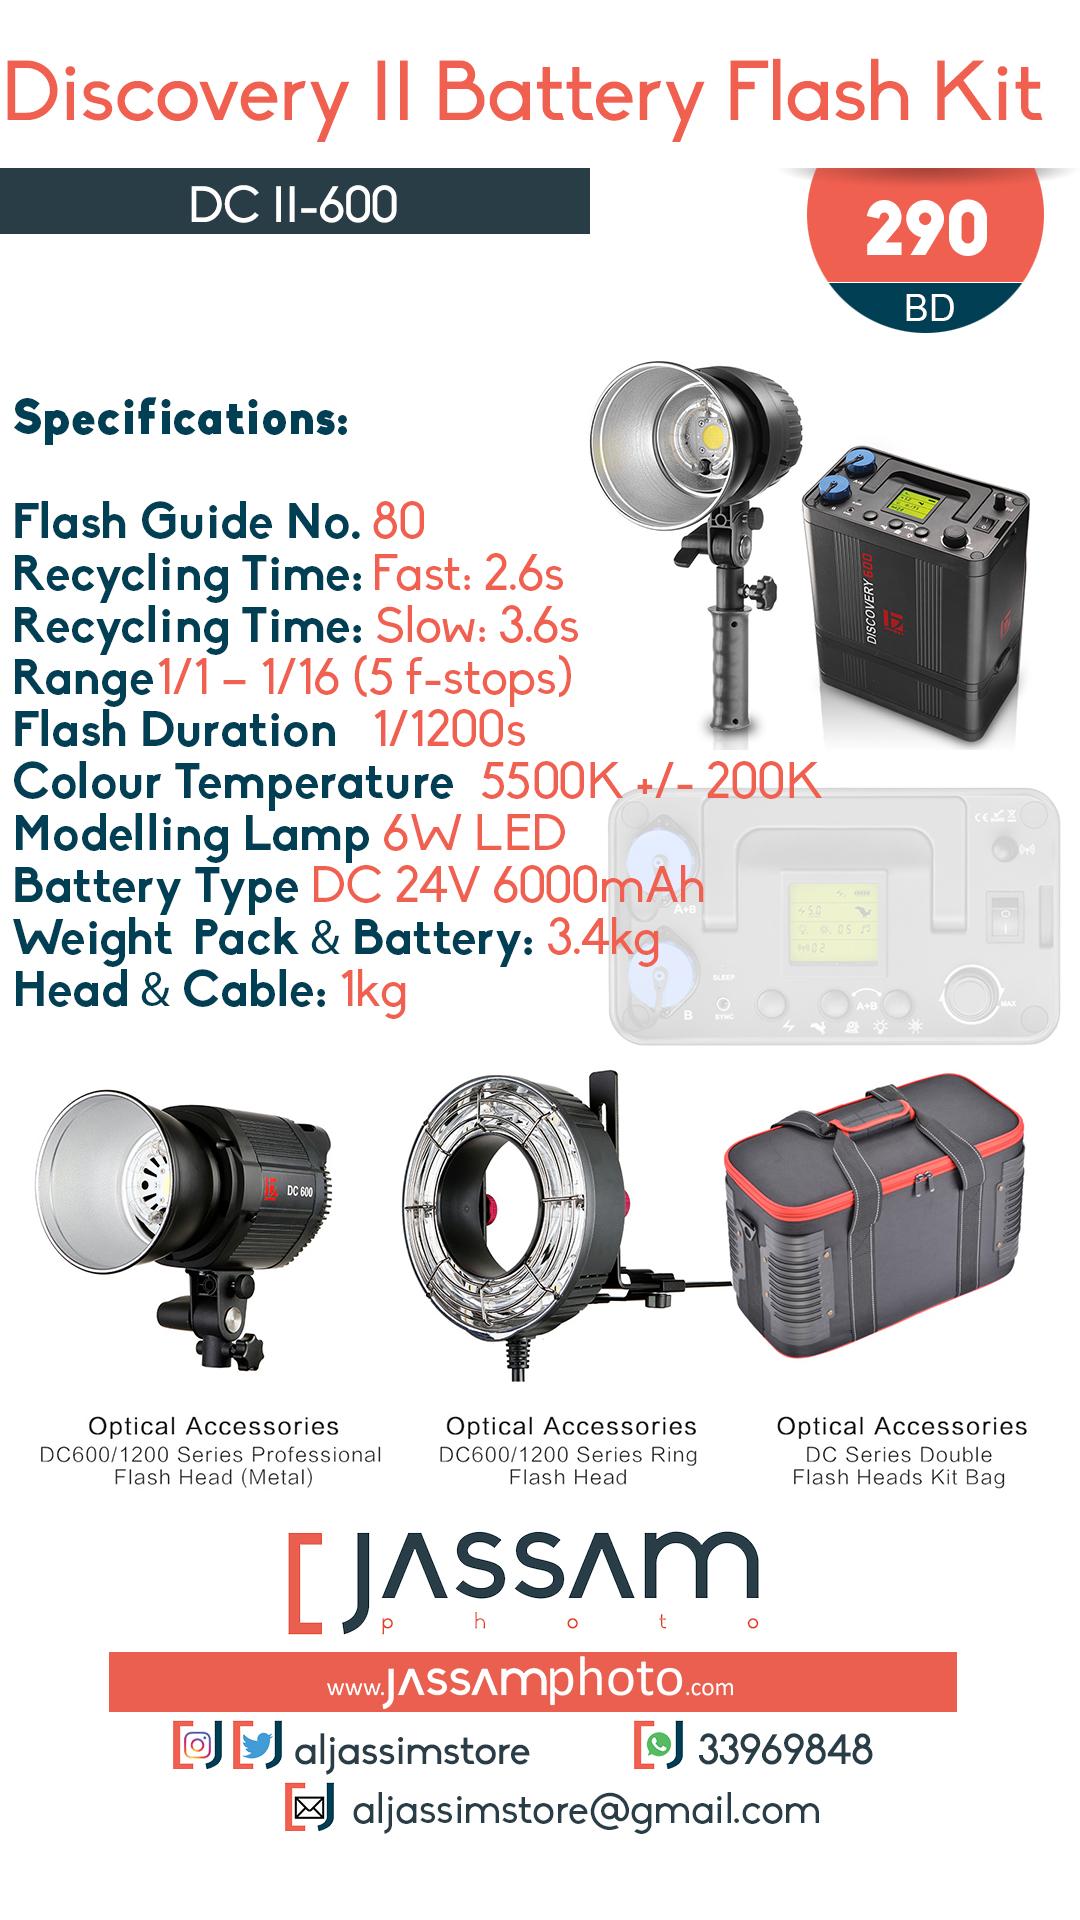 DCII-600 Flash Kit